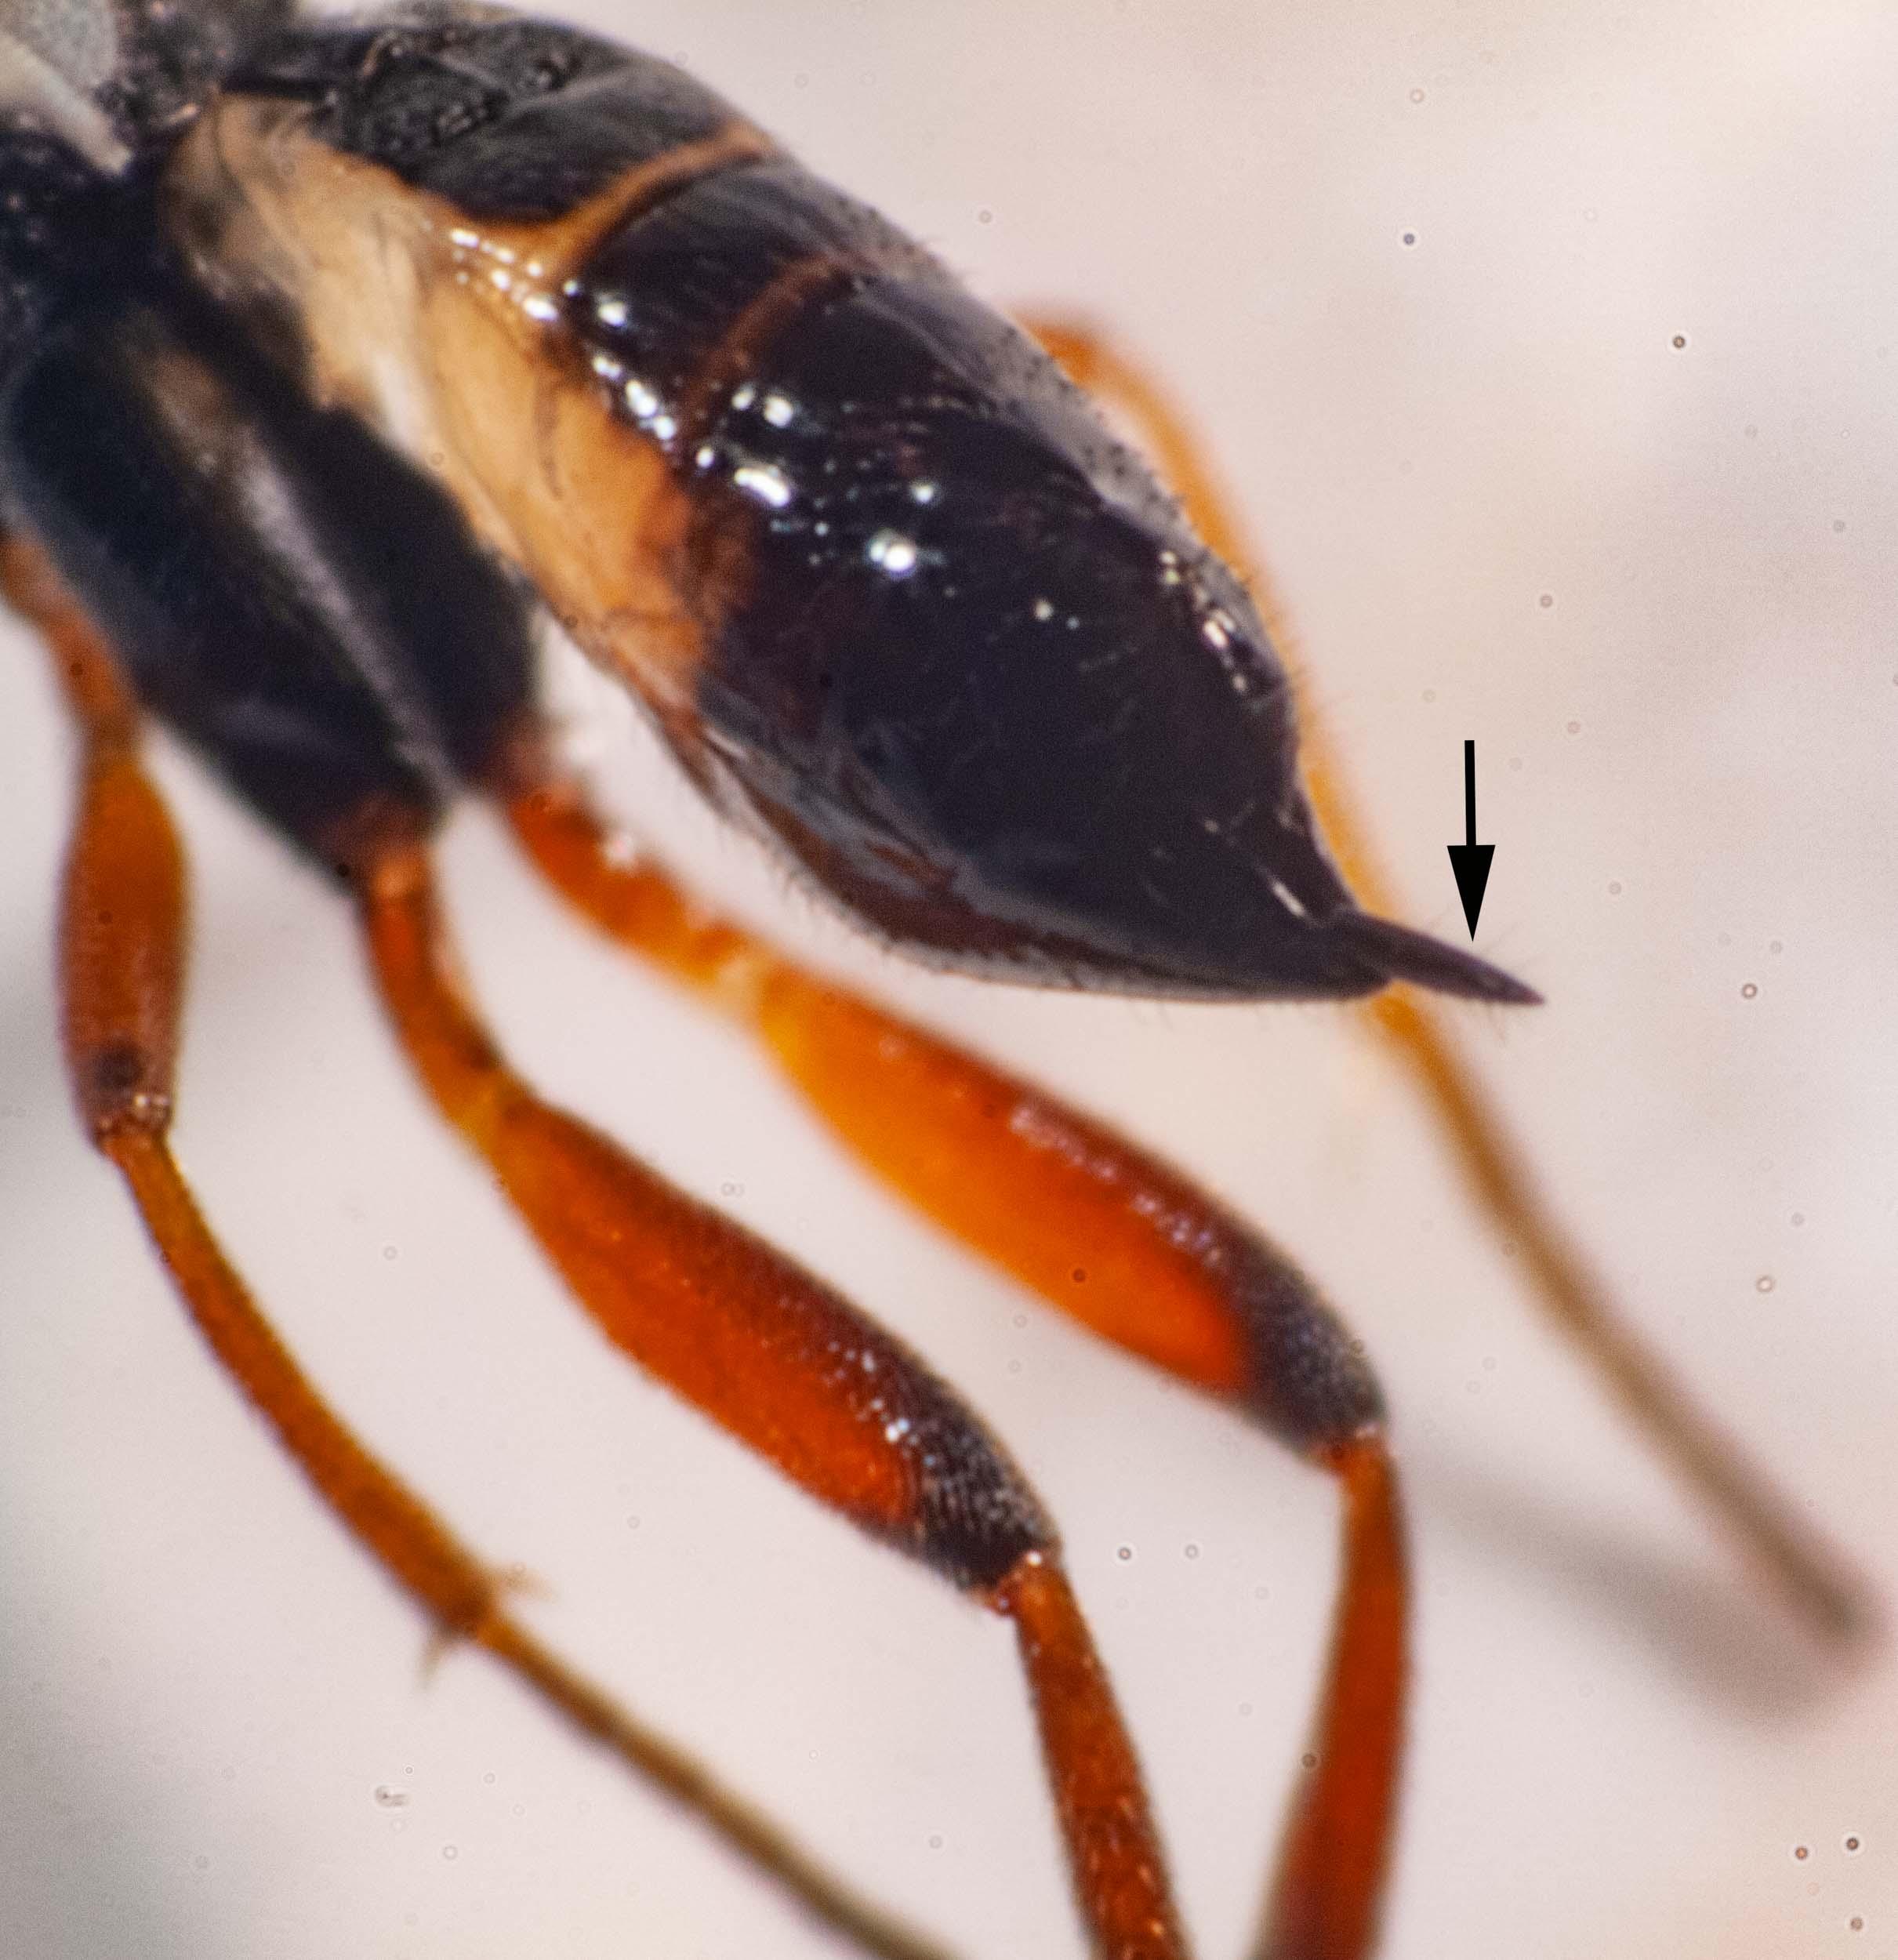 arrow shows the ovipositor